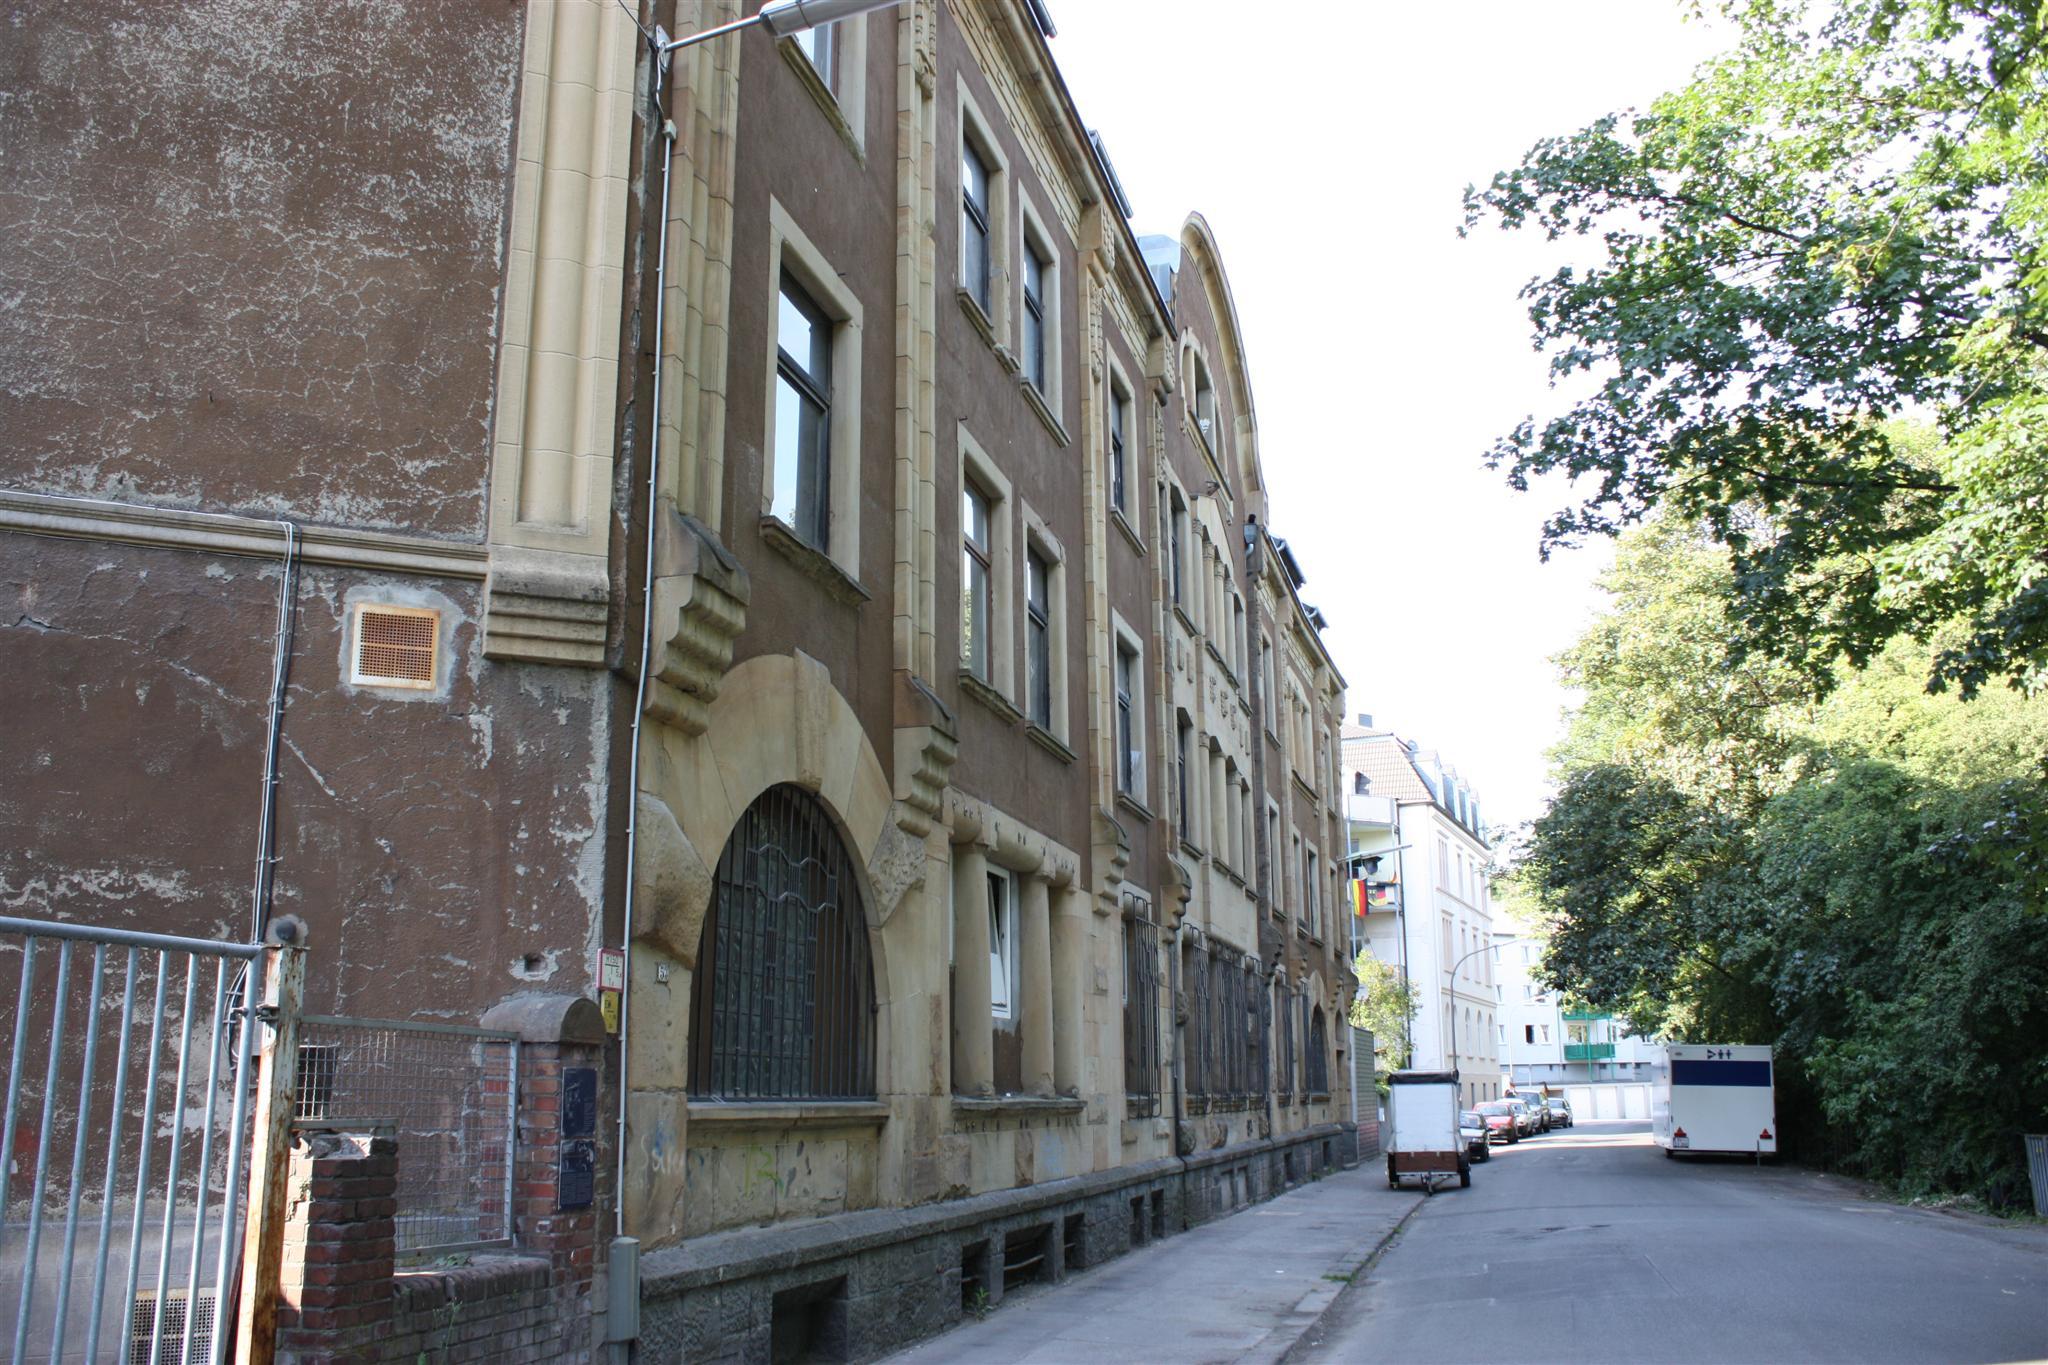 Konsumgenossenschaft Vorwärts in Wuppertal-Barmen